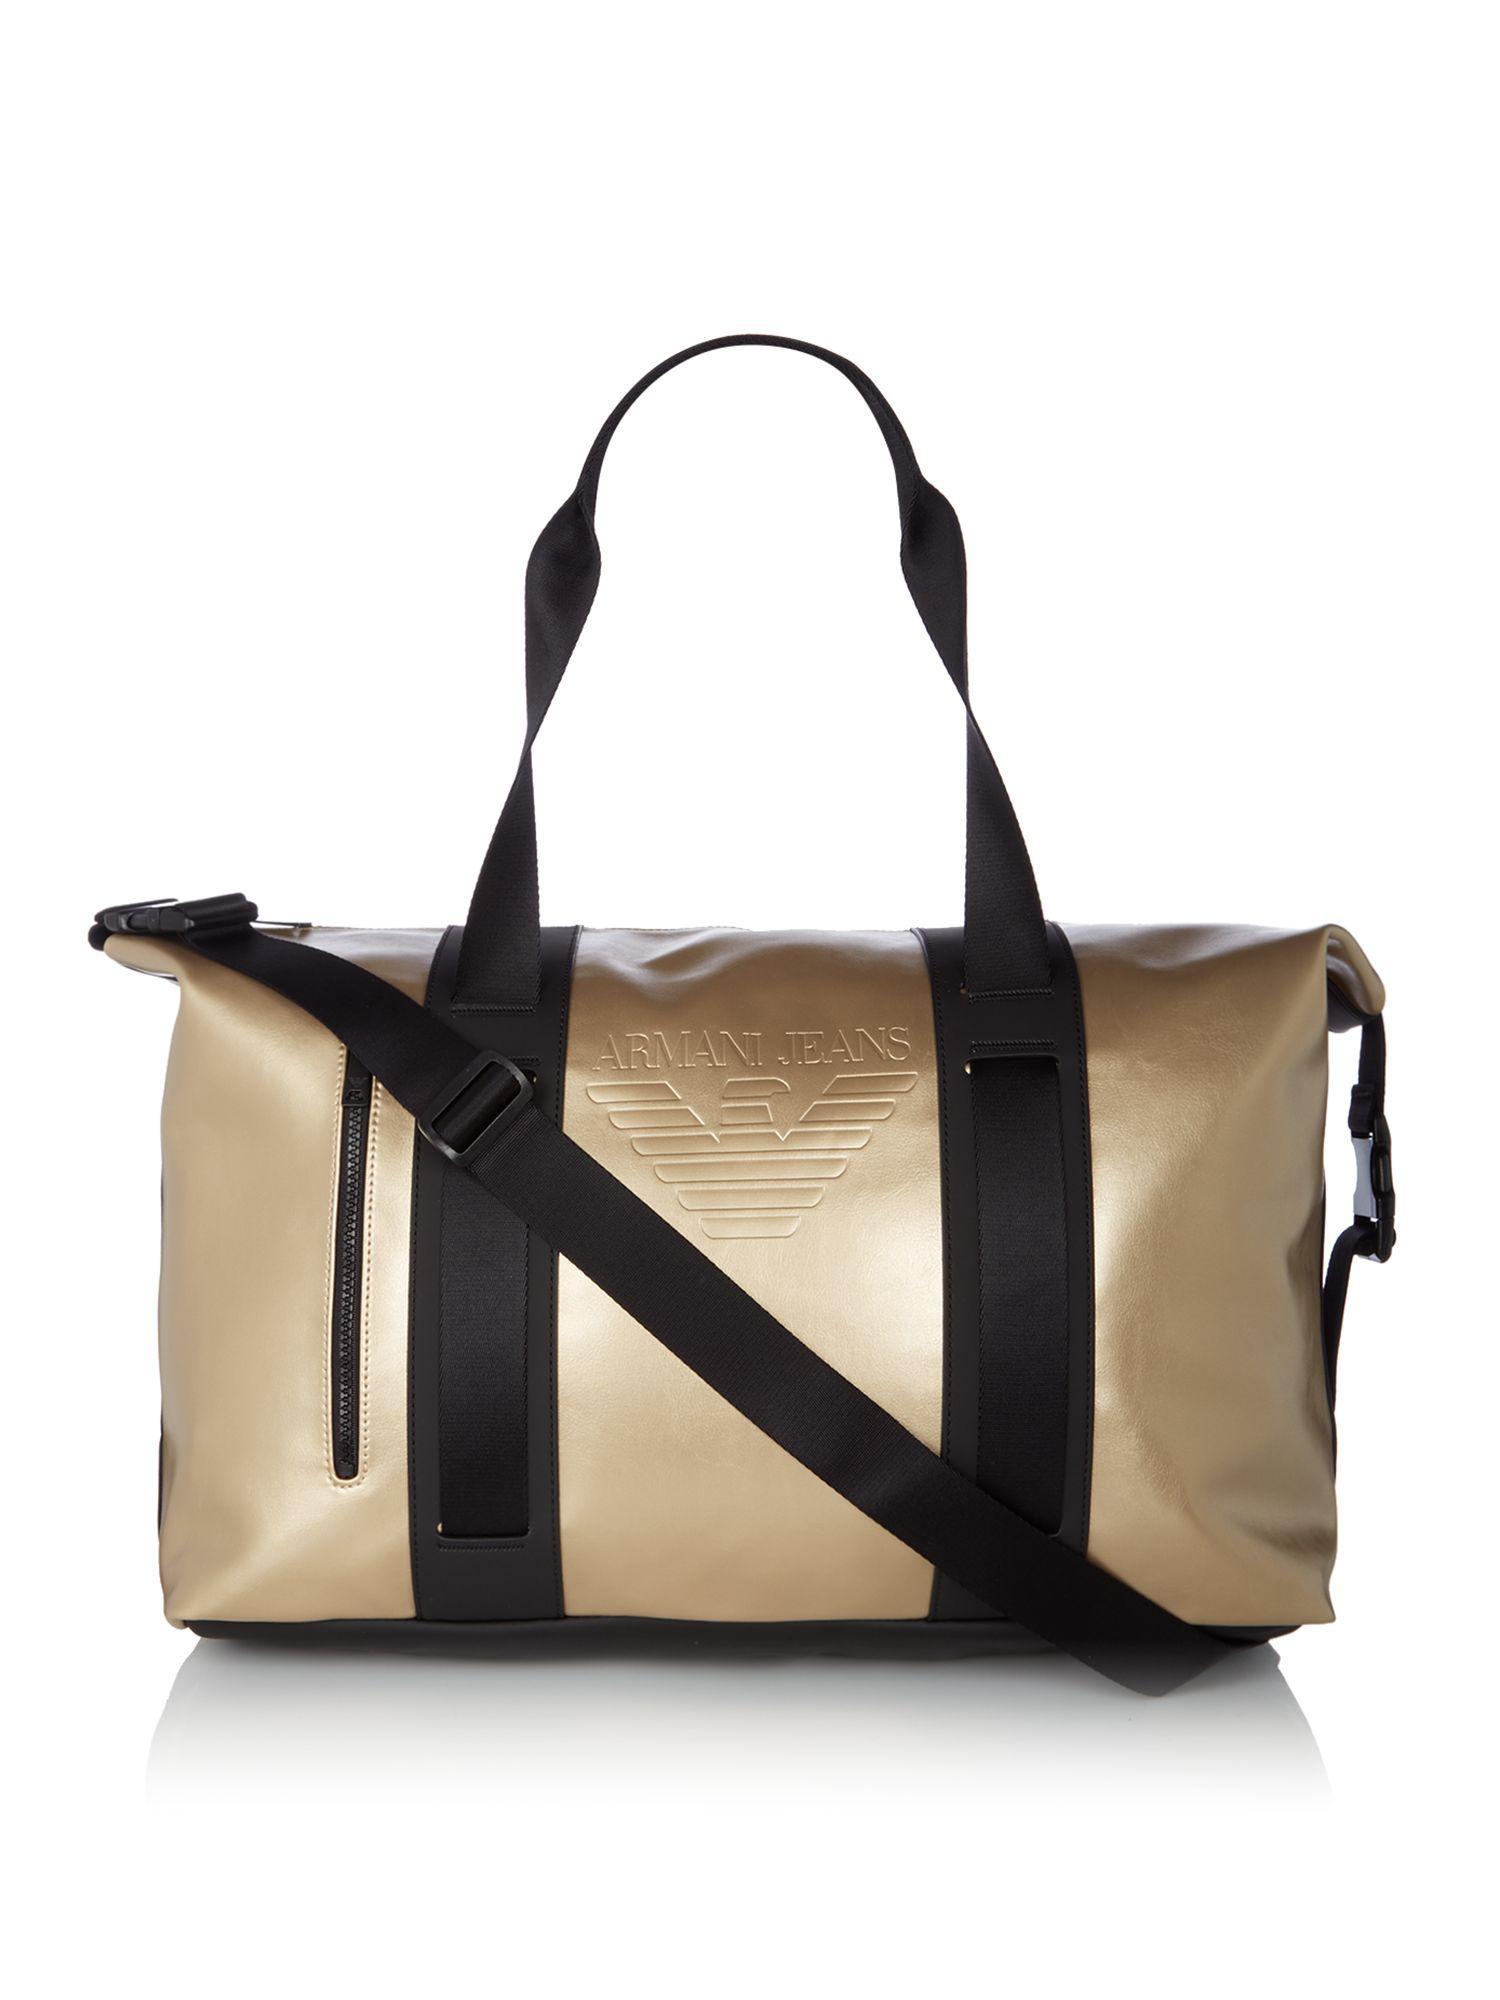 ... dirt cheap a99ba 07dc2 Armani Jeans Man Bag House Of Fraser  Frenchafricana 2018 ... 7921037a0e3b3